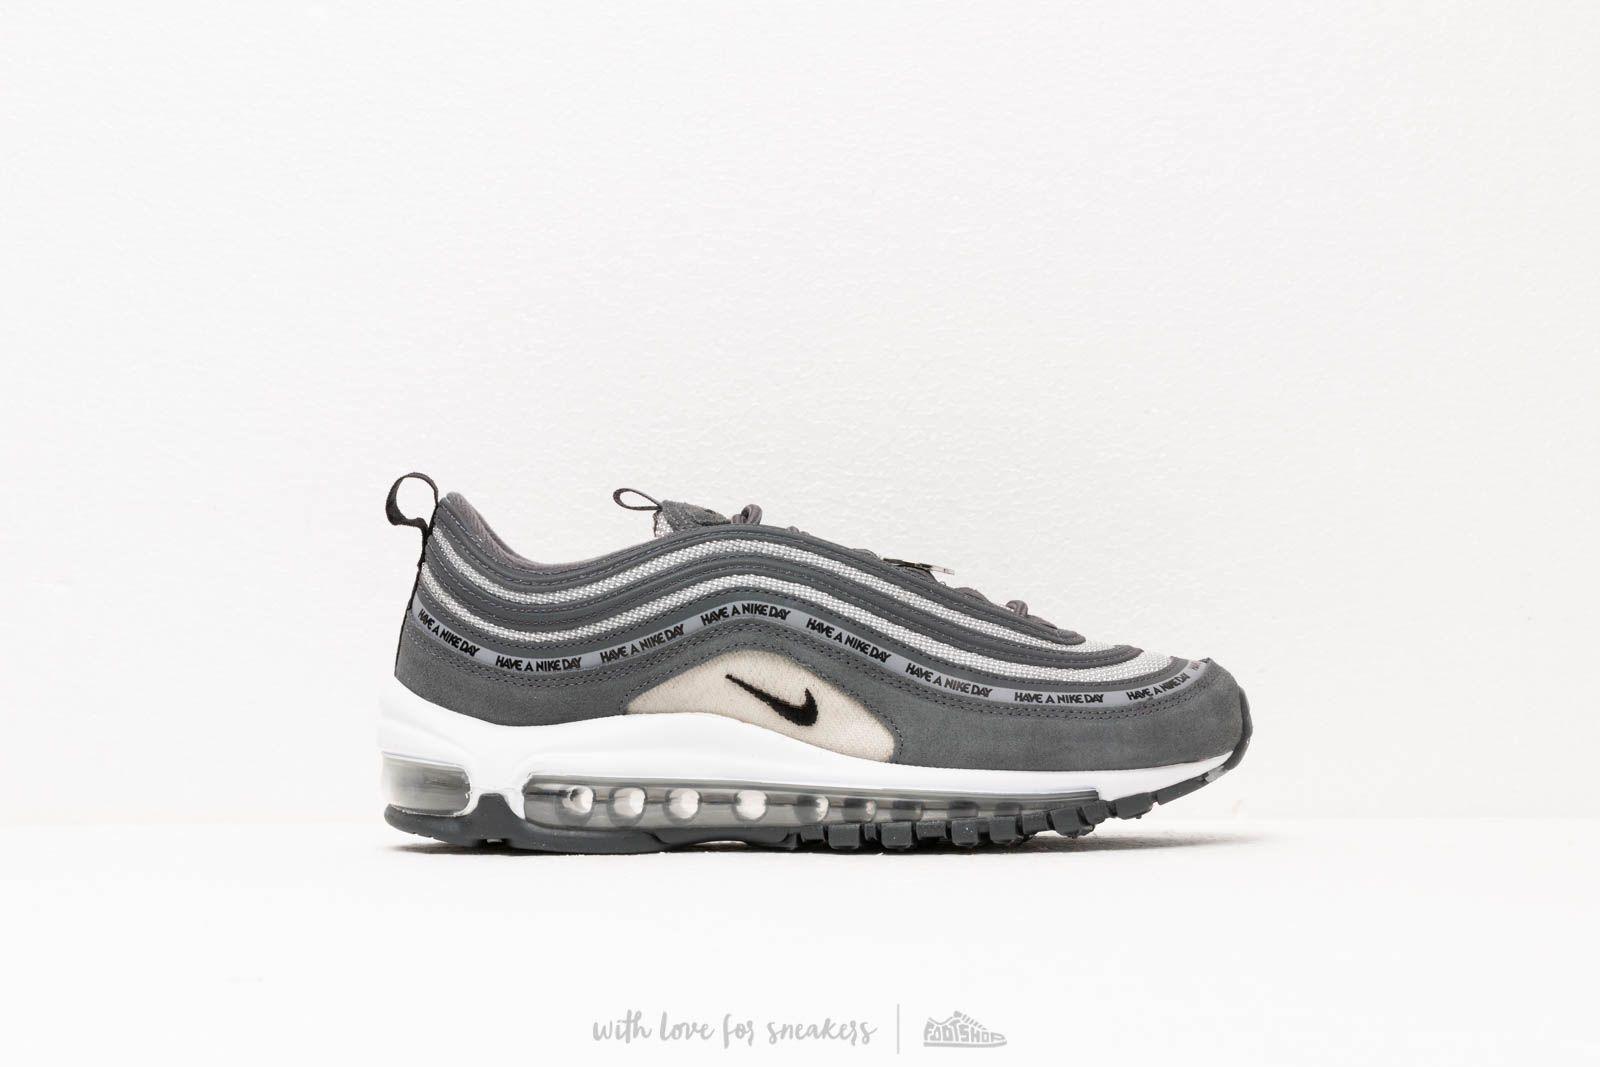 detailed look d529a c8242 Nike Air Max 97 Se (GS) Dark Grey/ Black-Wolf Grey-White | Footshop